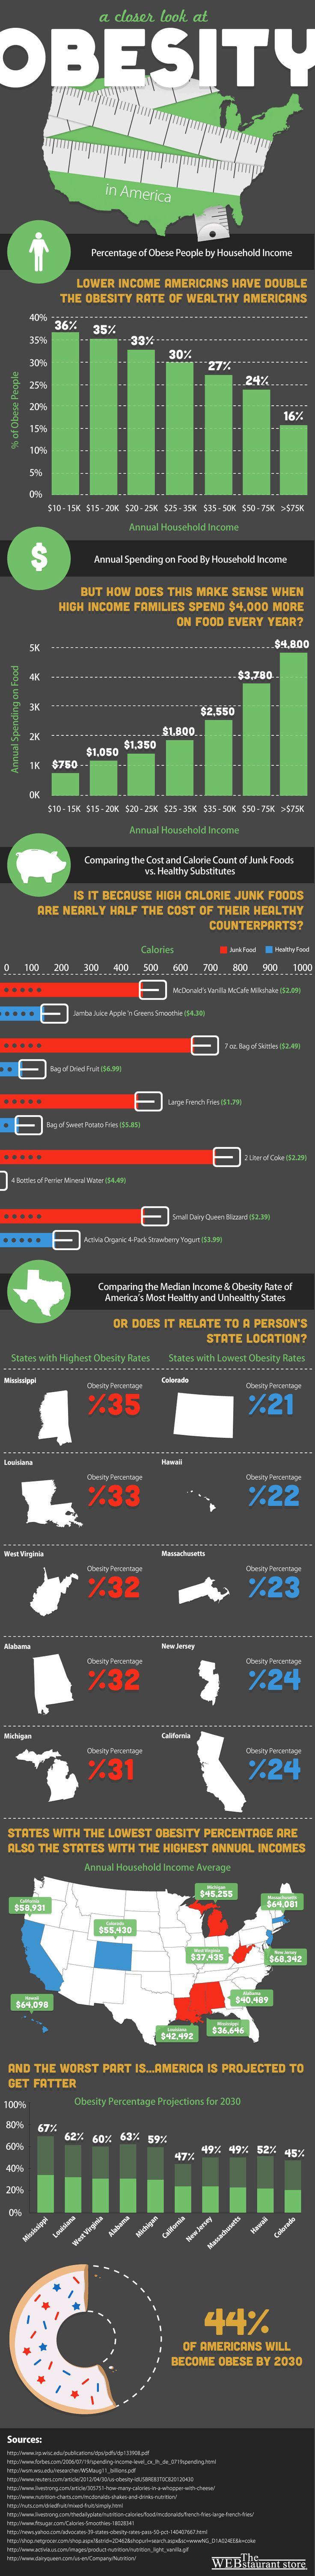 Sertraline cost cvs.doc - A Closer Look At Obesity In America